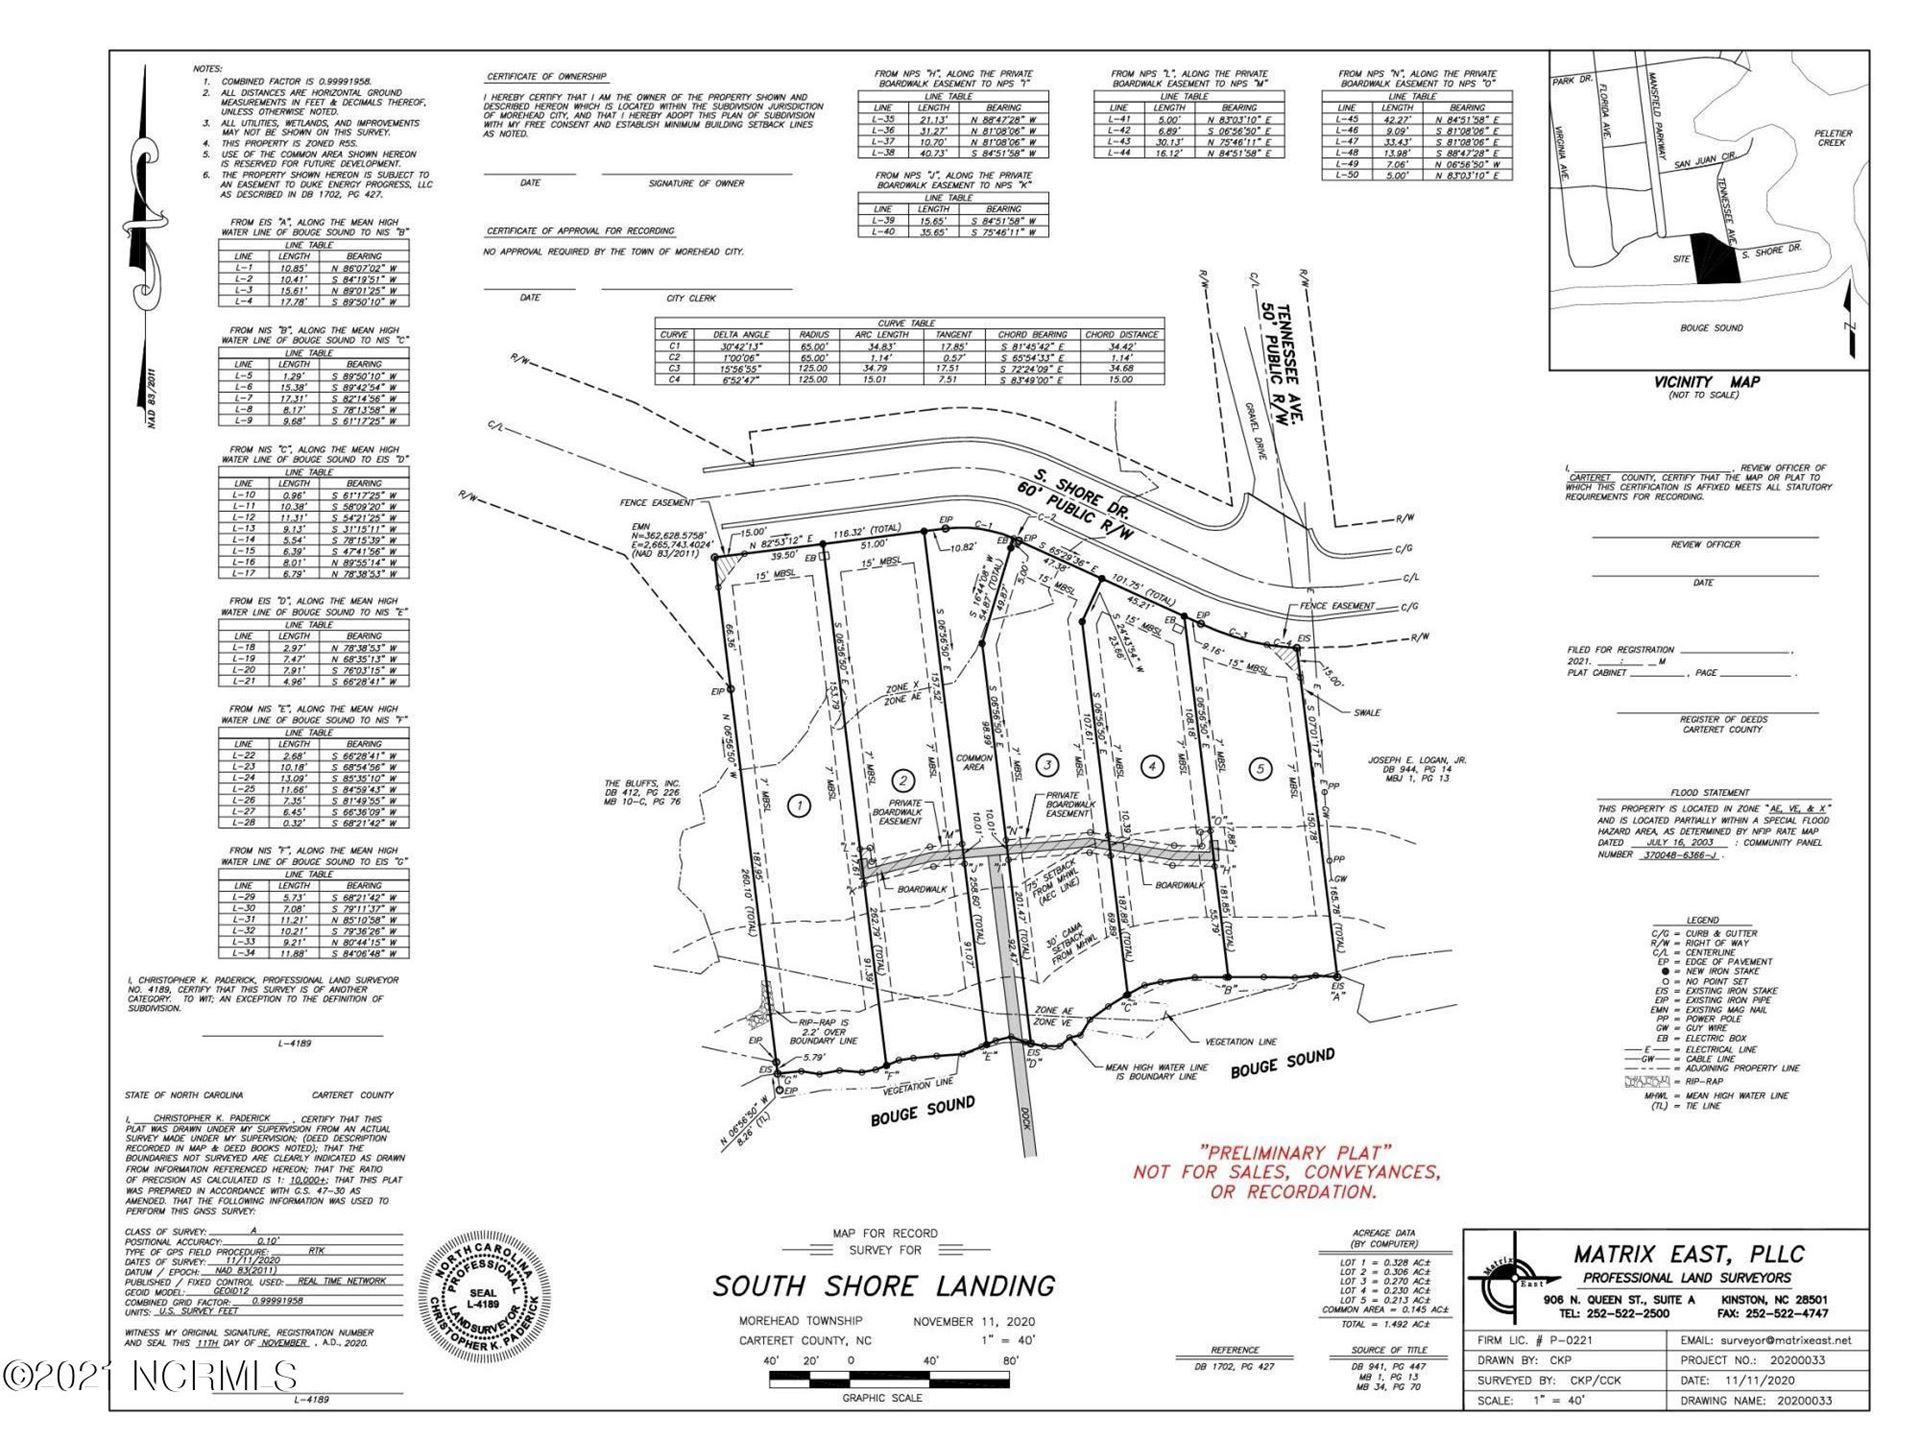 Photo of 4707 Lot 1 S Shore Drive, Morehead City, NC 28557 (MLS # 100284957)